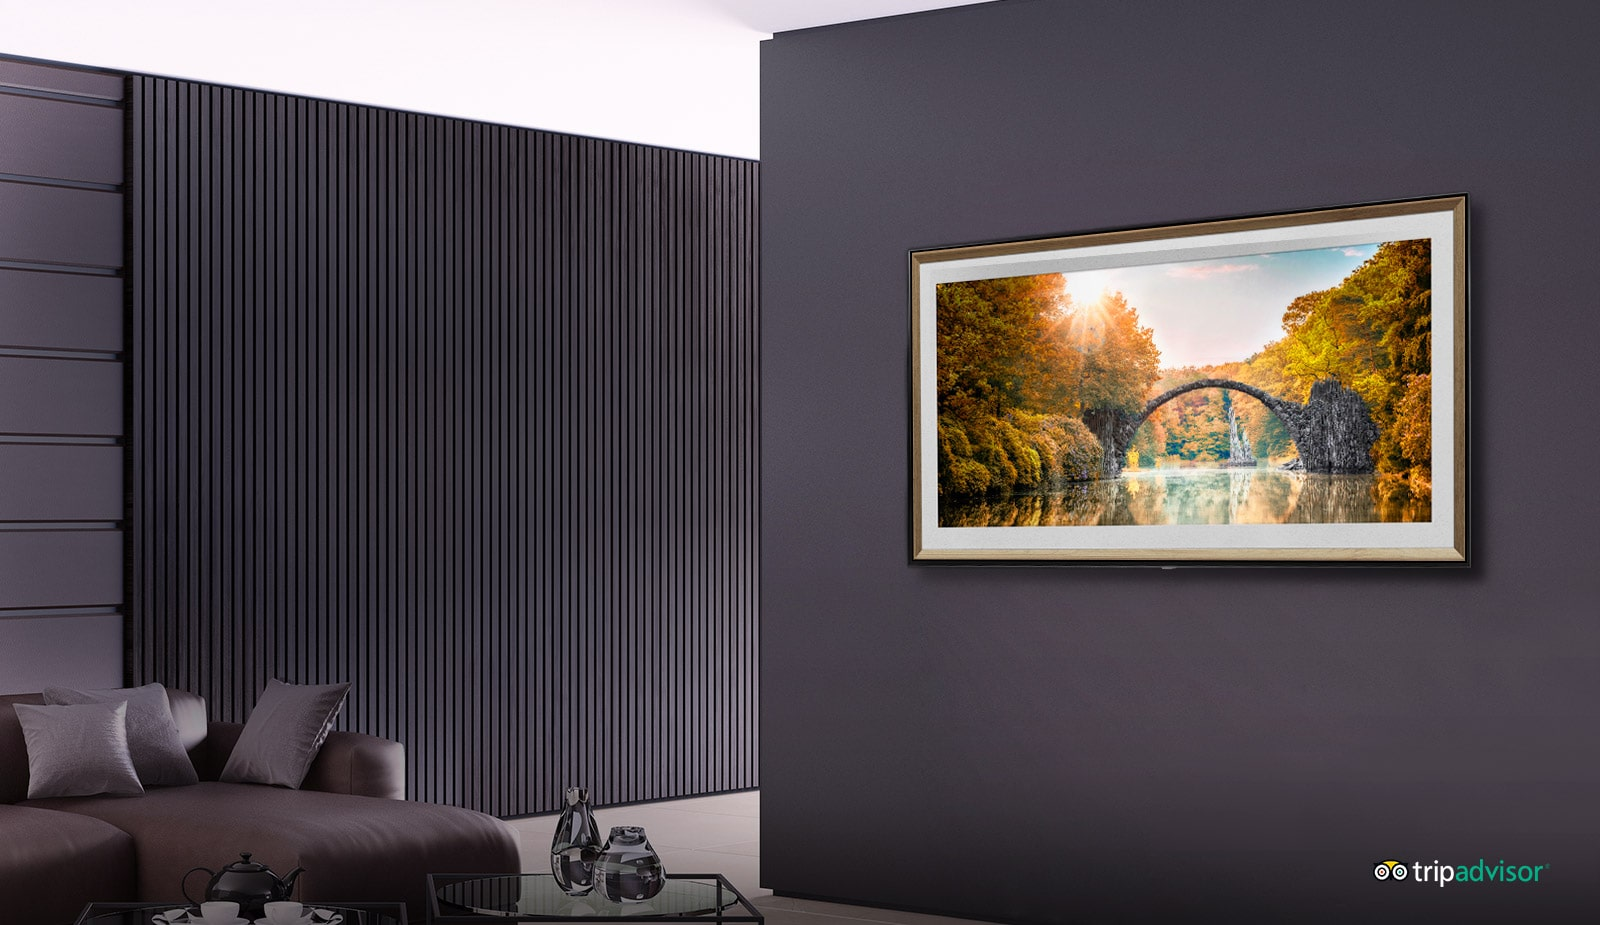 TV-NanoCell-SM85-12-Gallery-Mode-Desktop